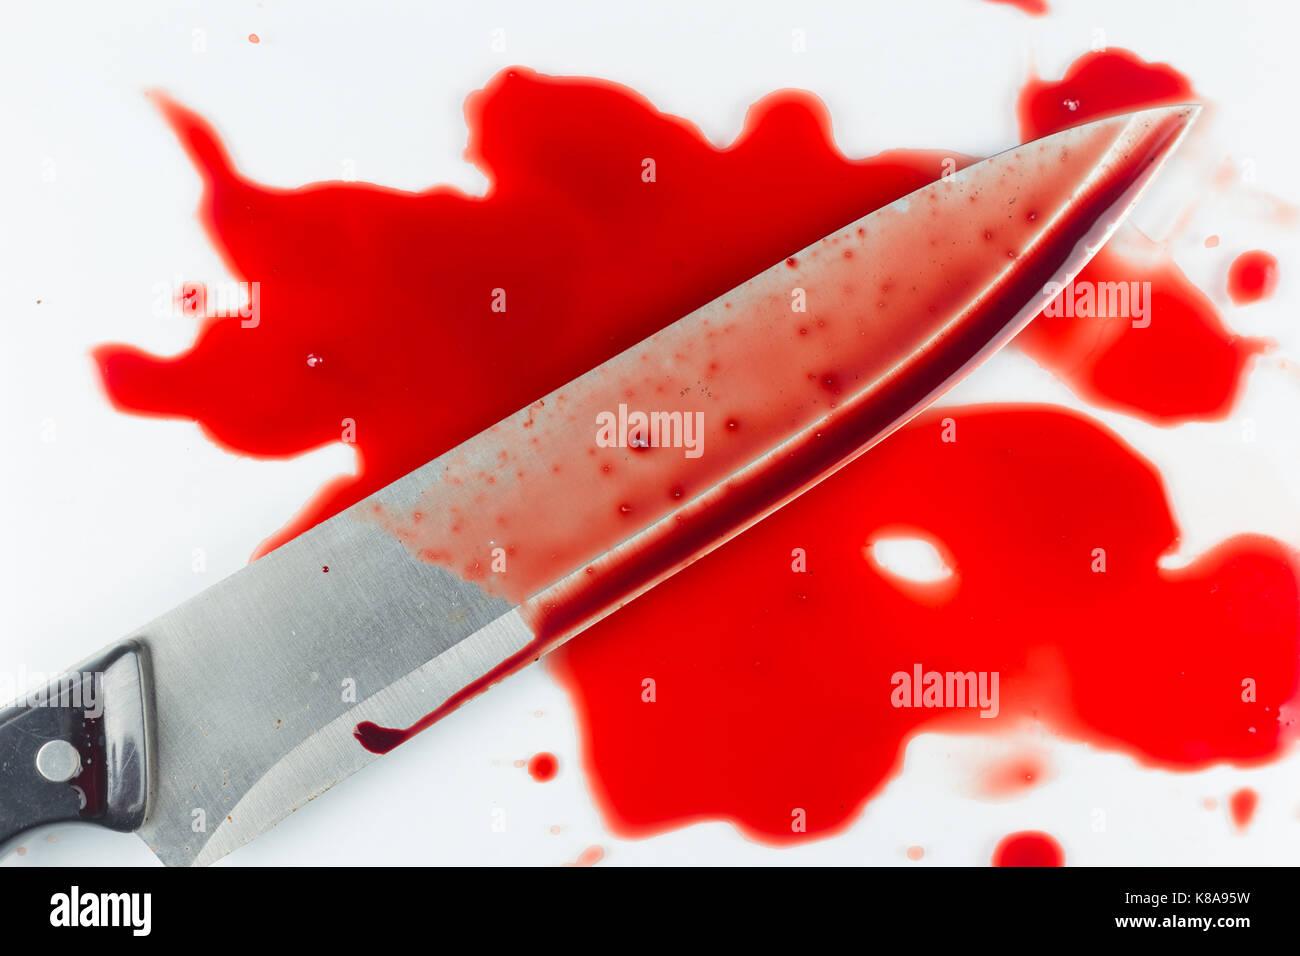 Blood, Murder - Stock Image